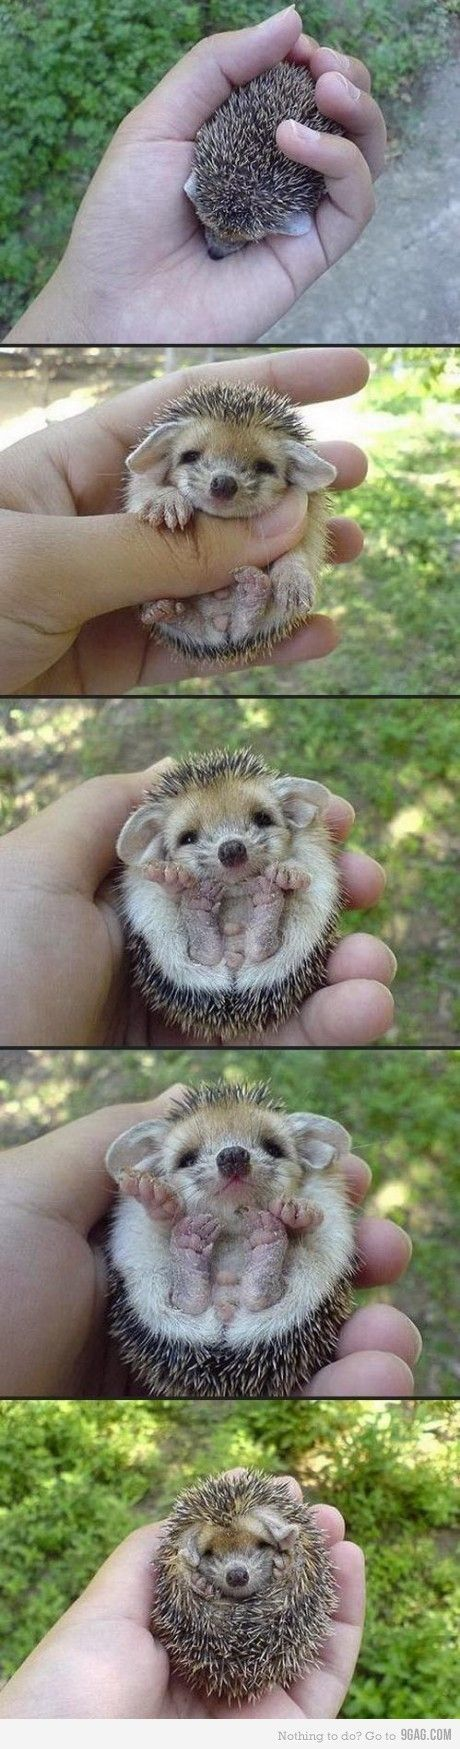 So tiny and cute by ida